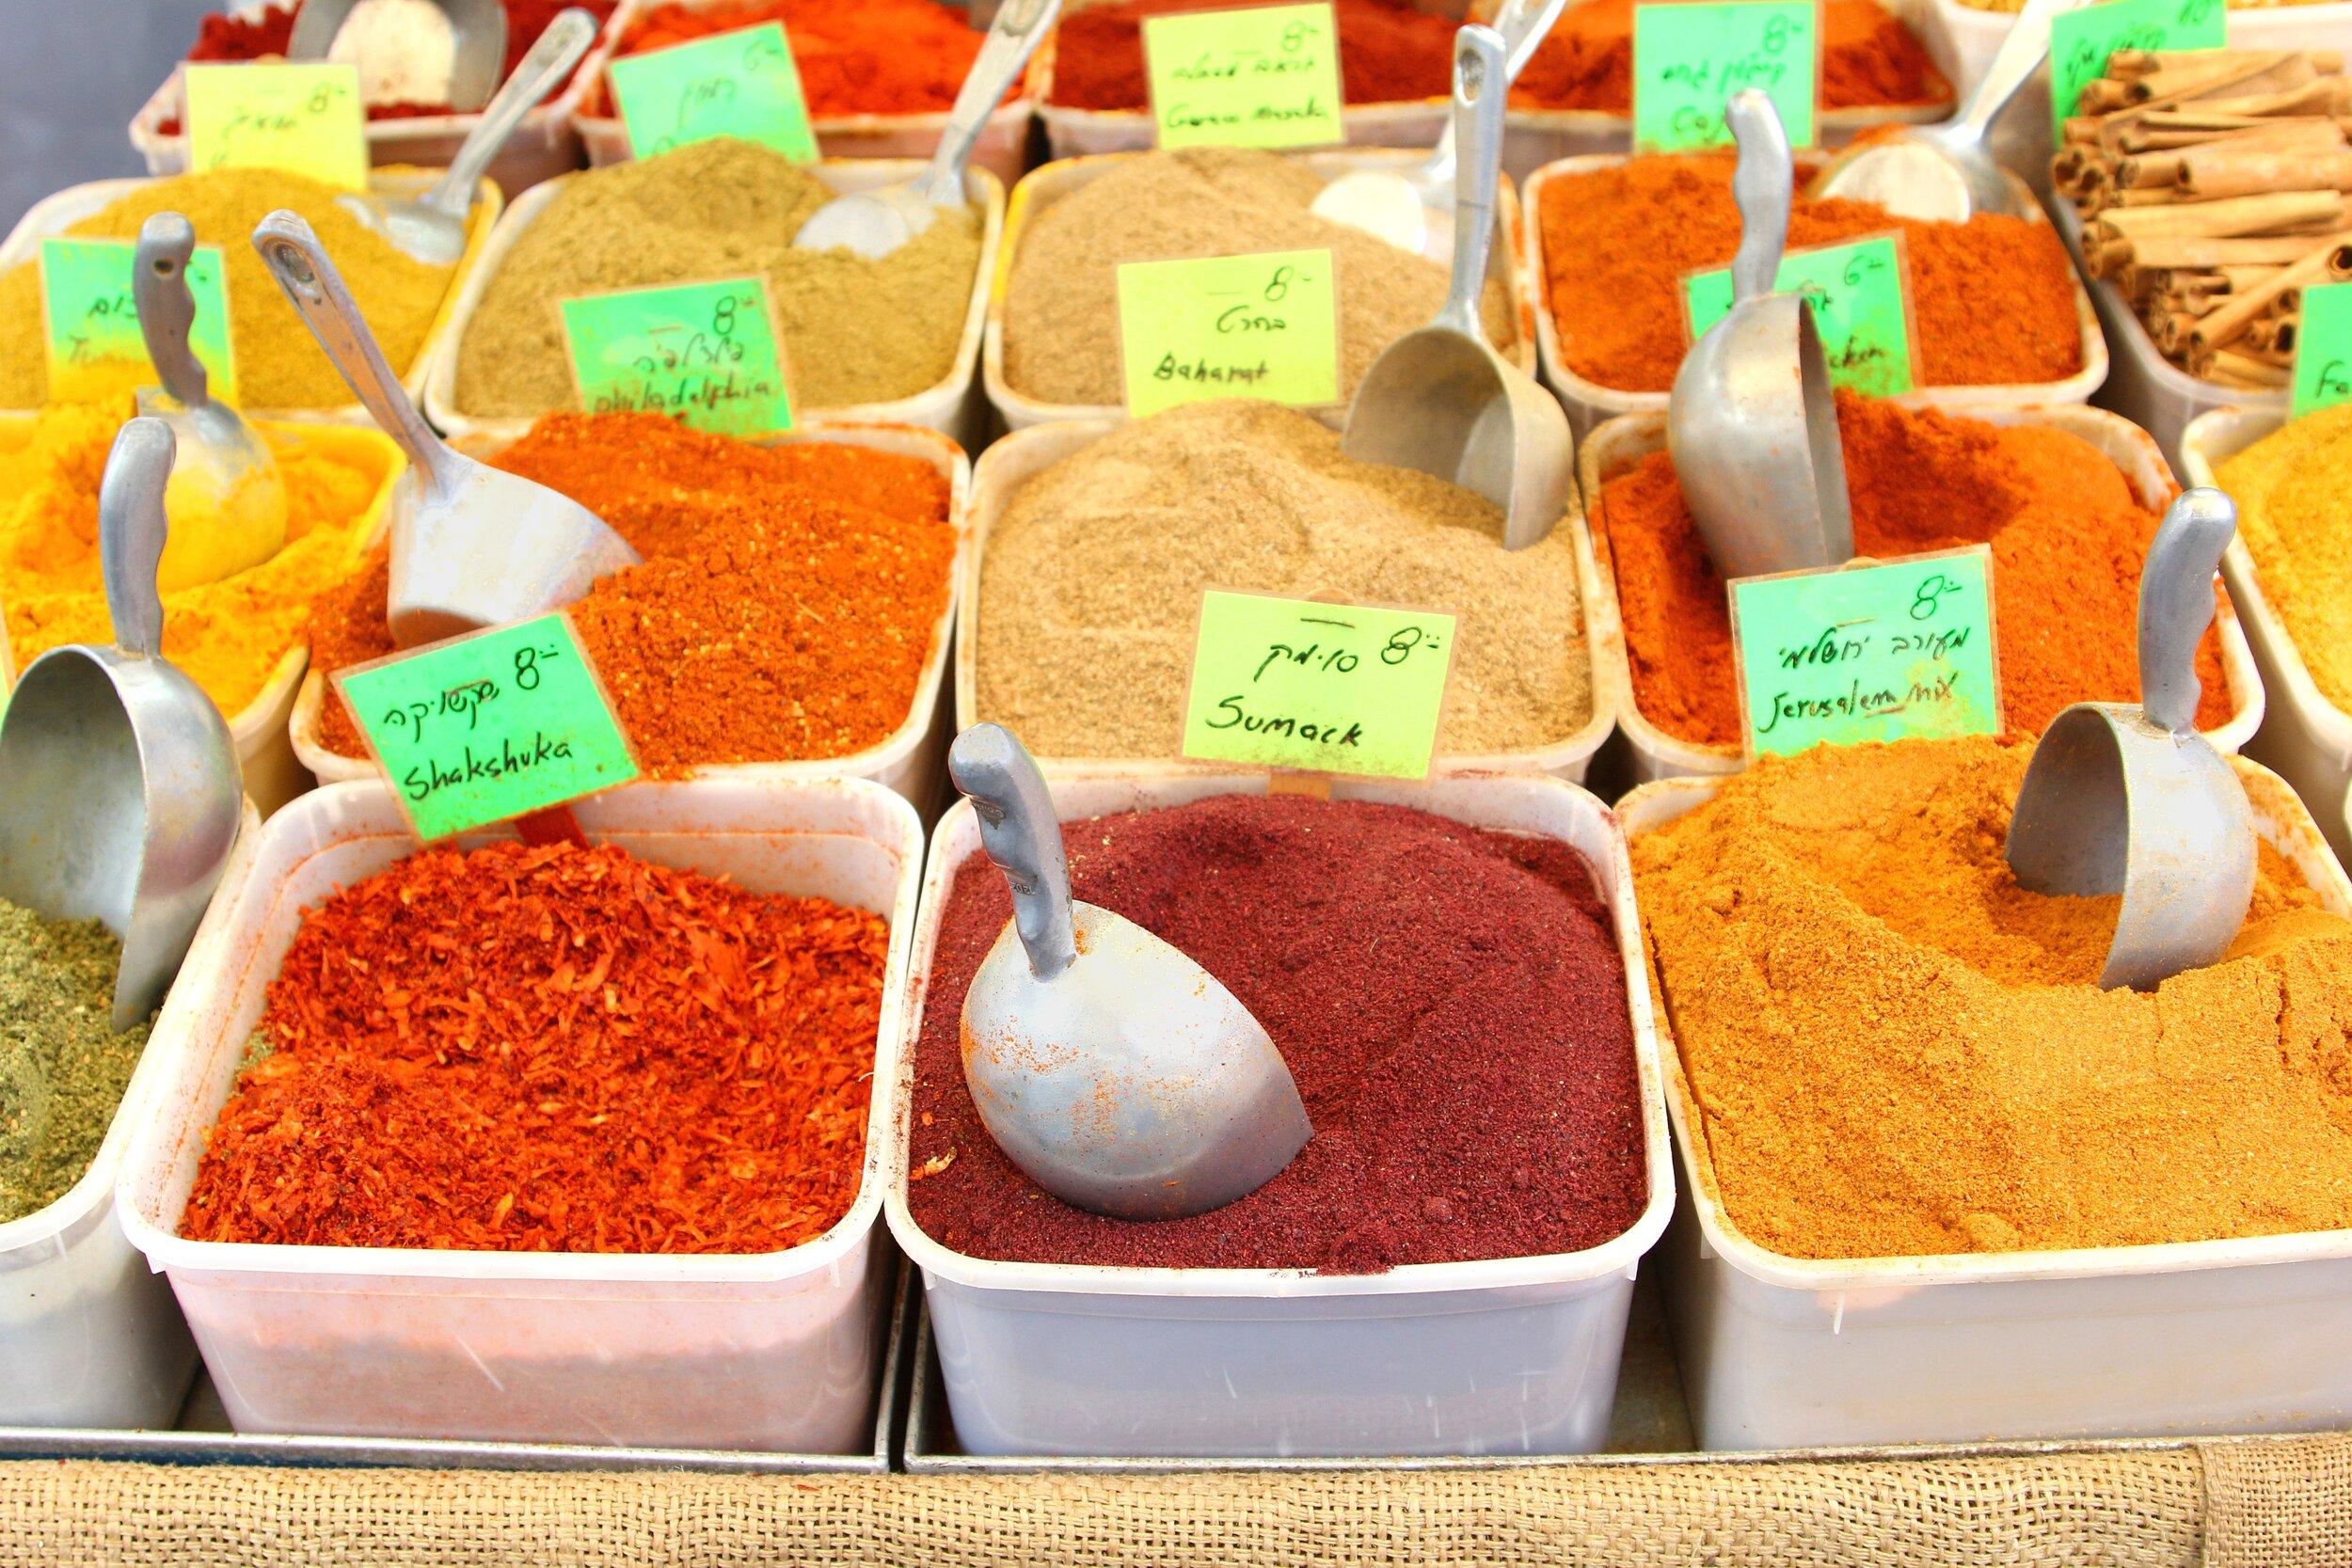 Spices at Shuk ha Carmel street food market in Tel Aviv.